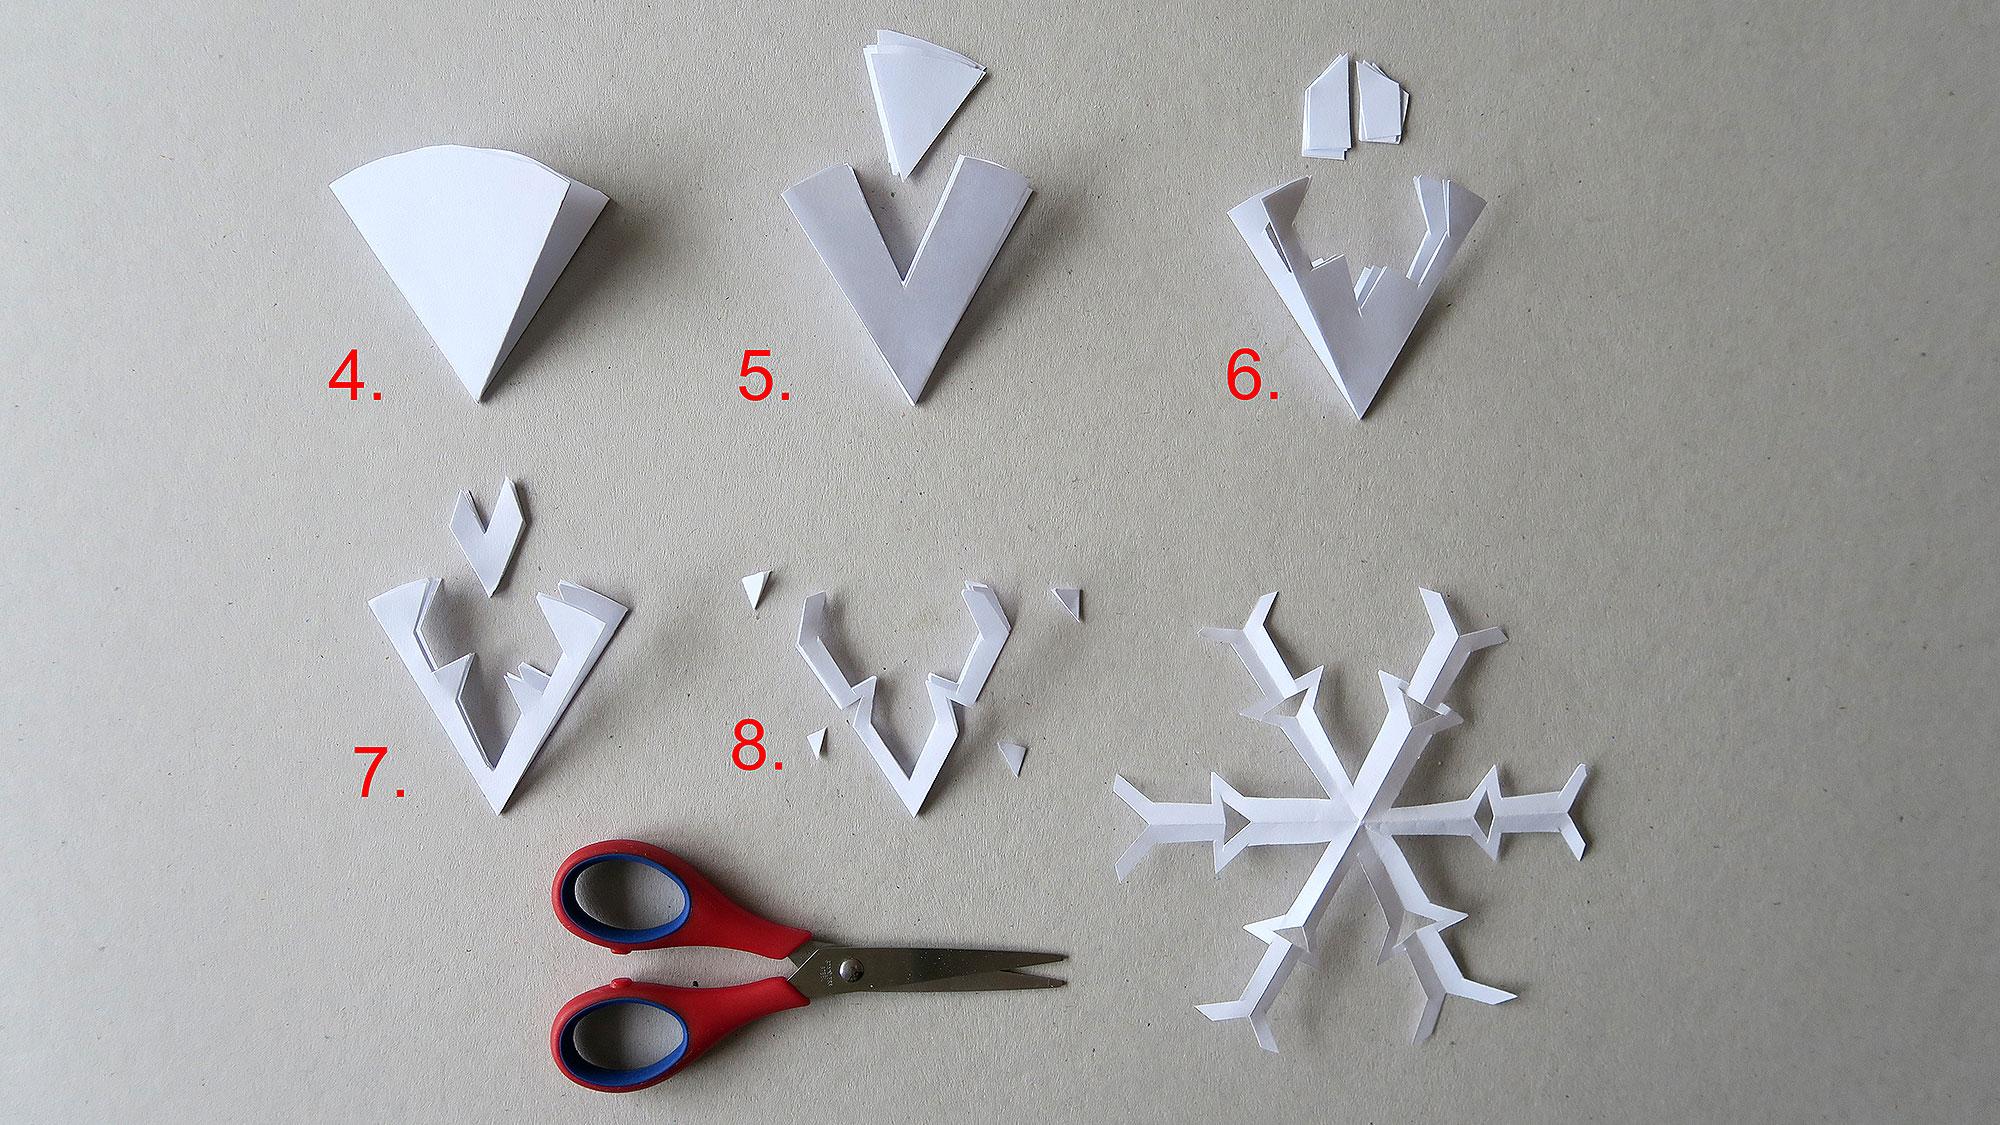 Fiocchi Di Neve Di Carta Facili : Motivi ritagliati in d un semplice fiocco di neve famigros